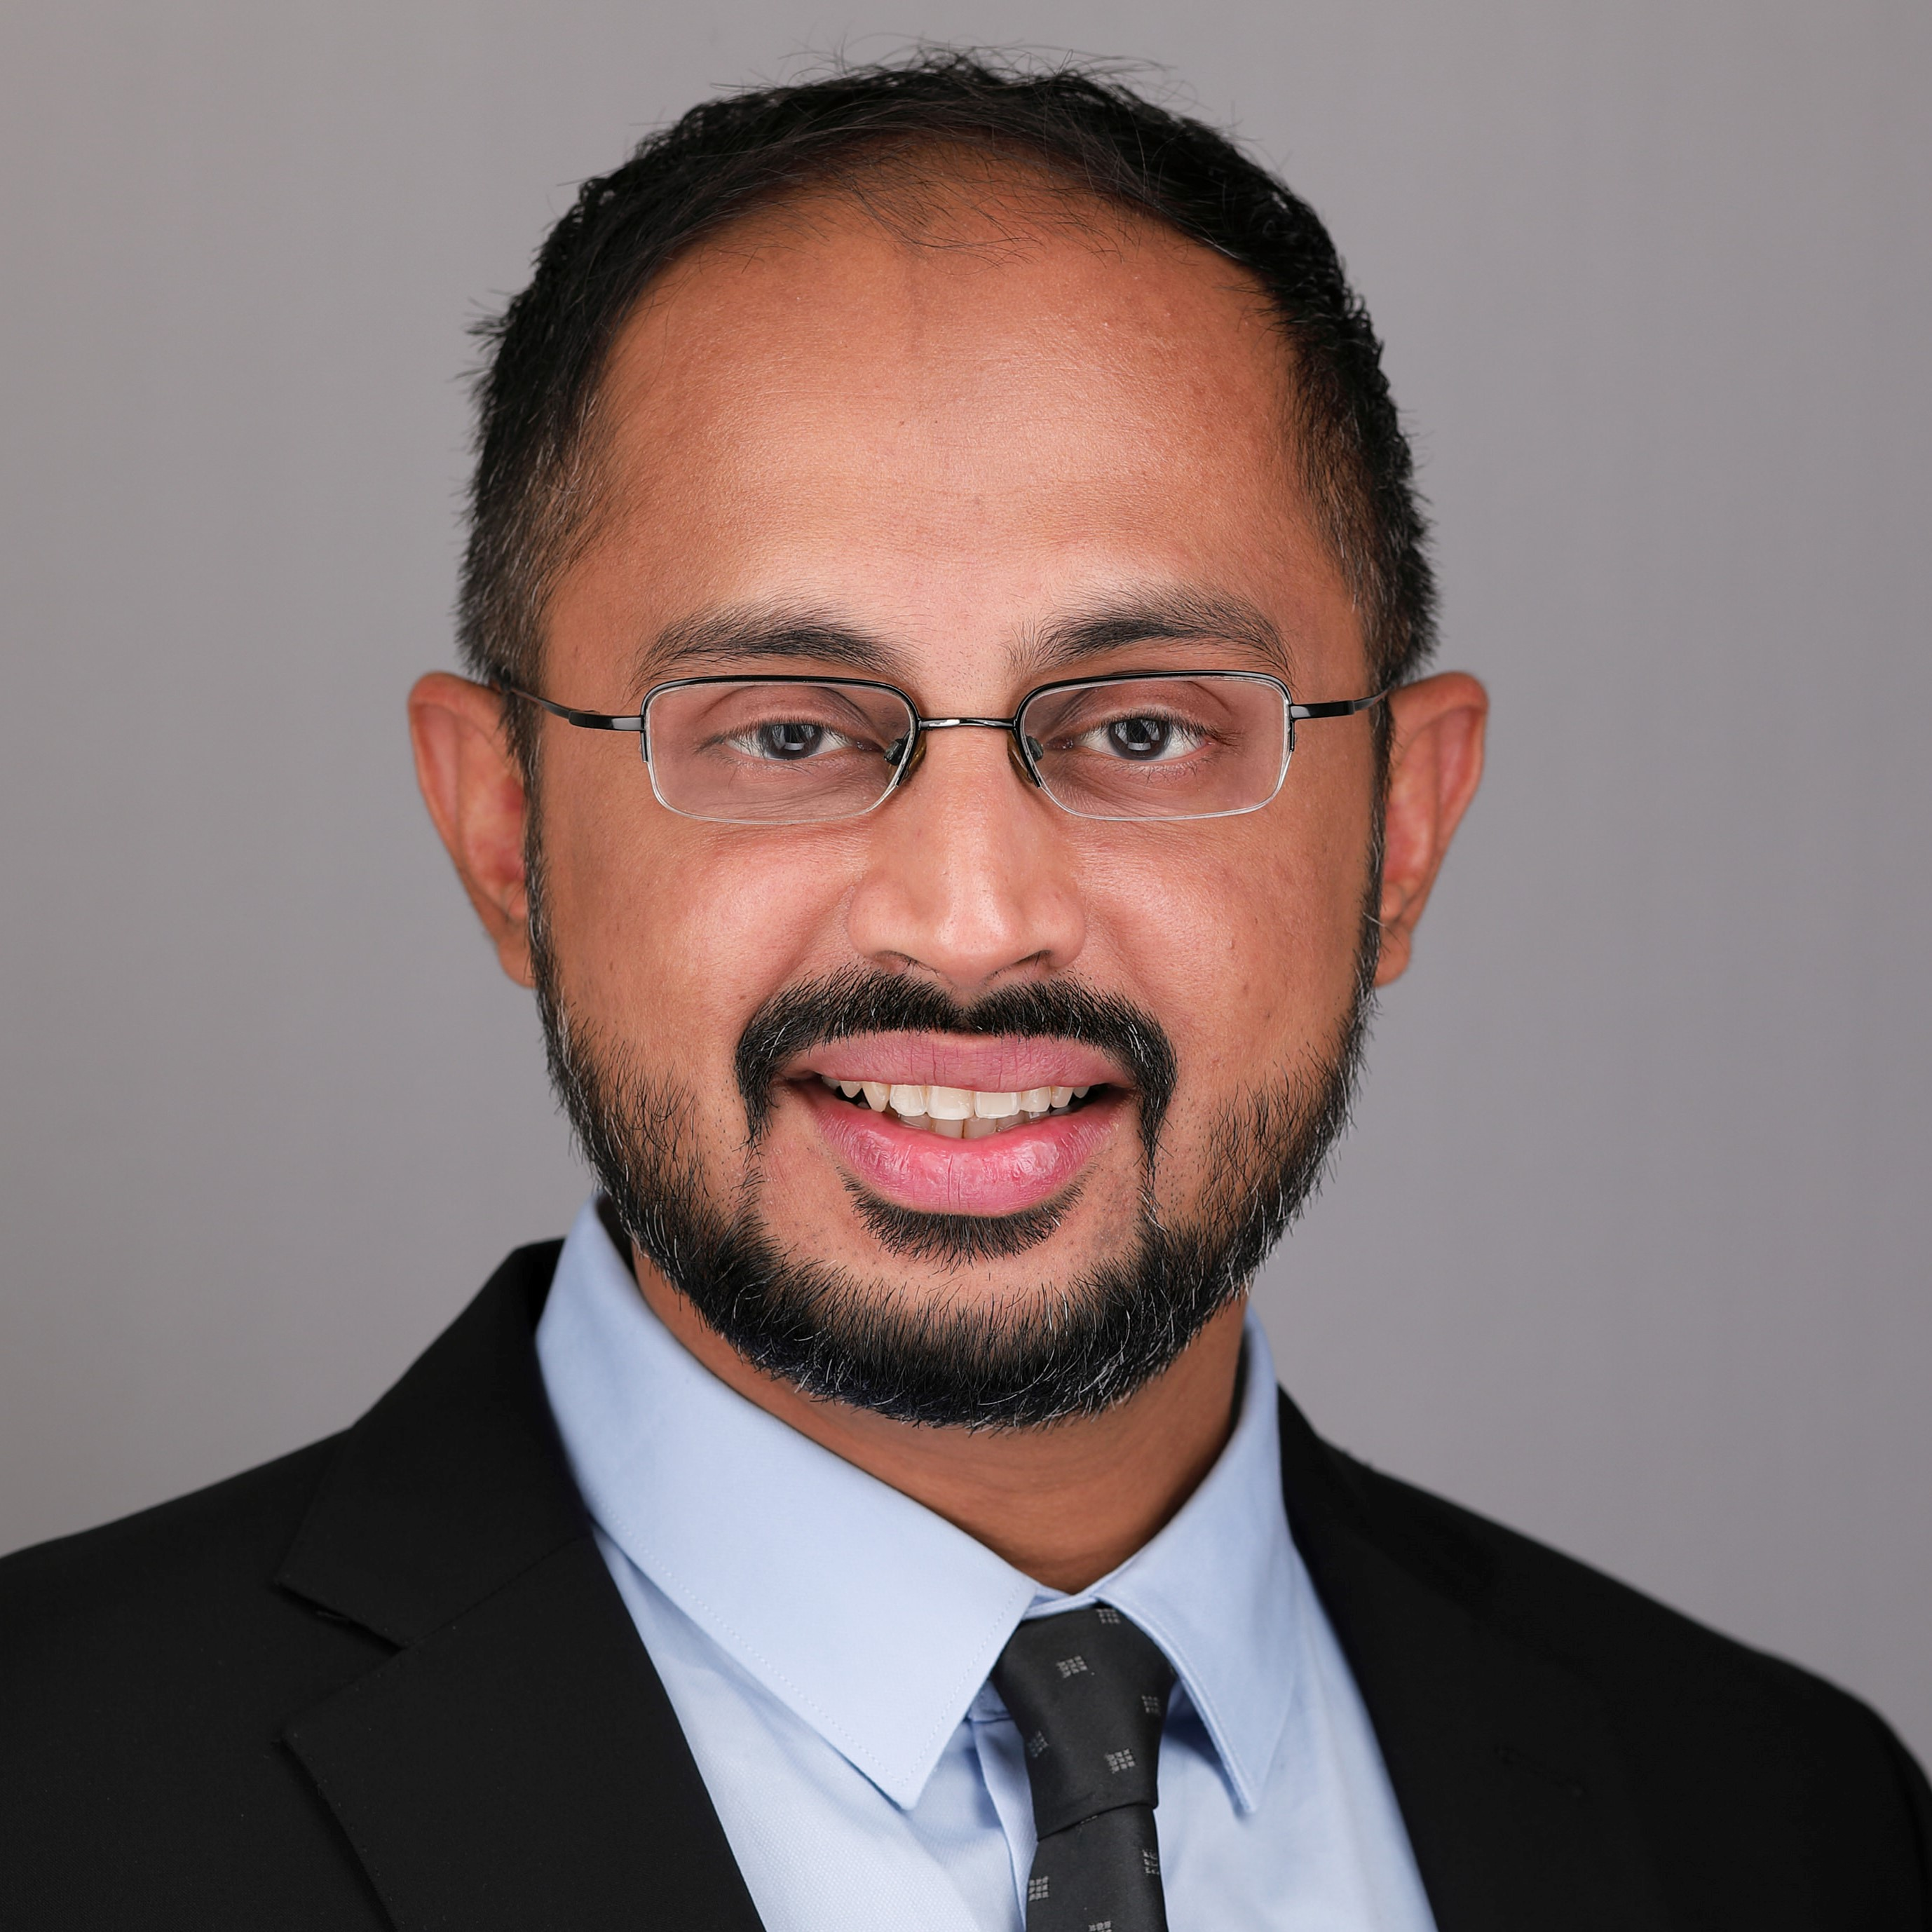 Abhiram Rajendran